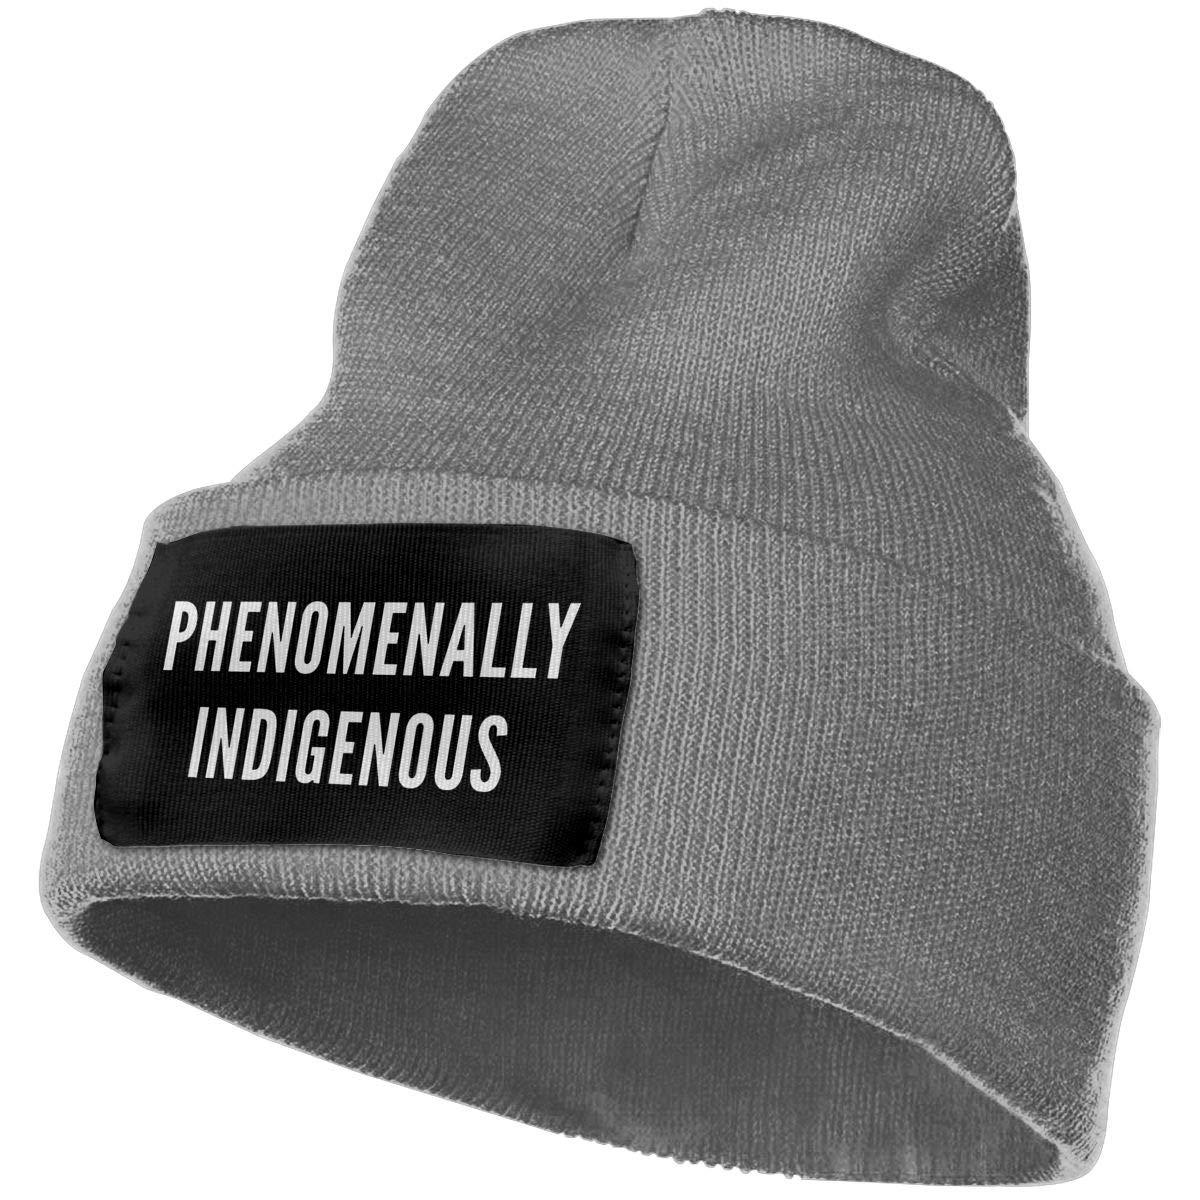 FORDSAN CP PHENOMENALLY Indigenous Mens Beanie Cap Skull Cap Winter Warm Knitting Hats.